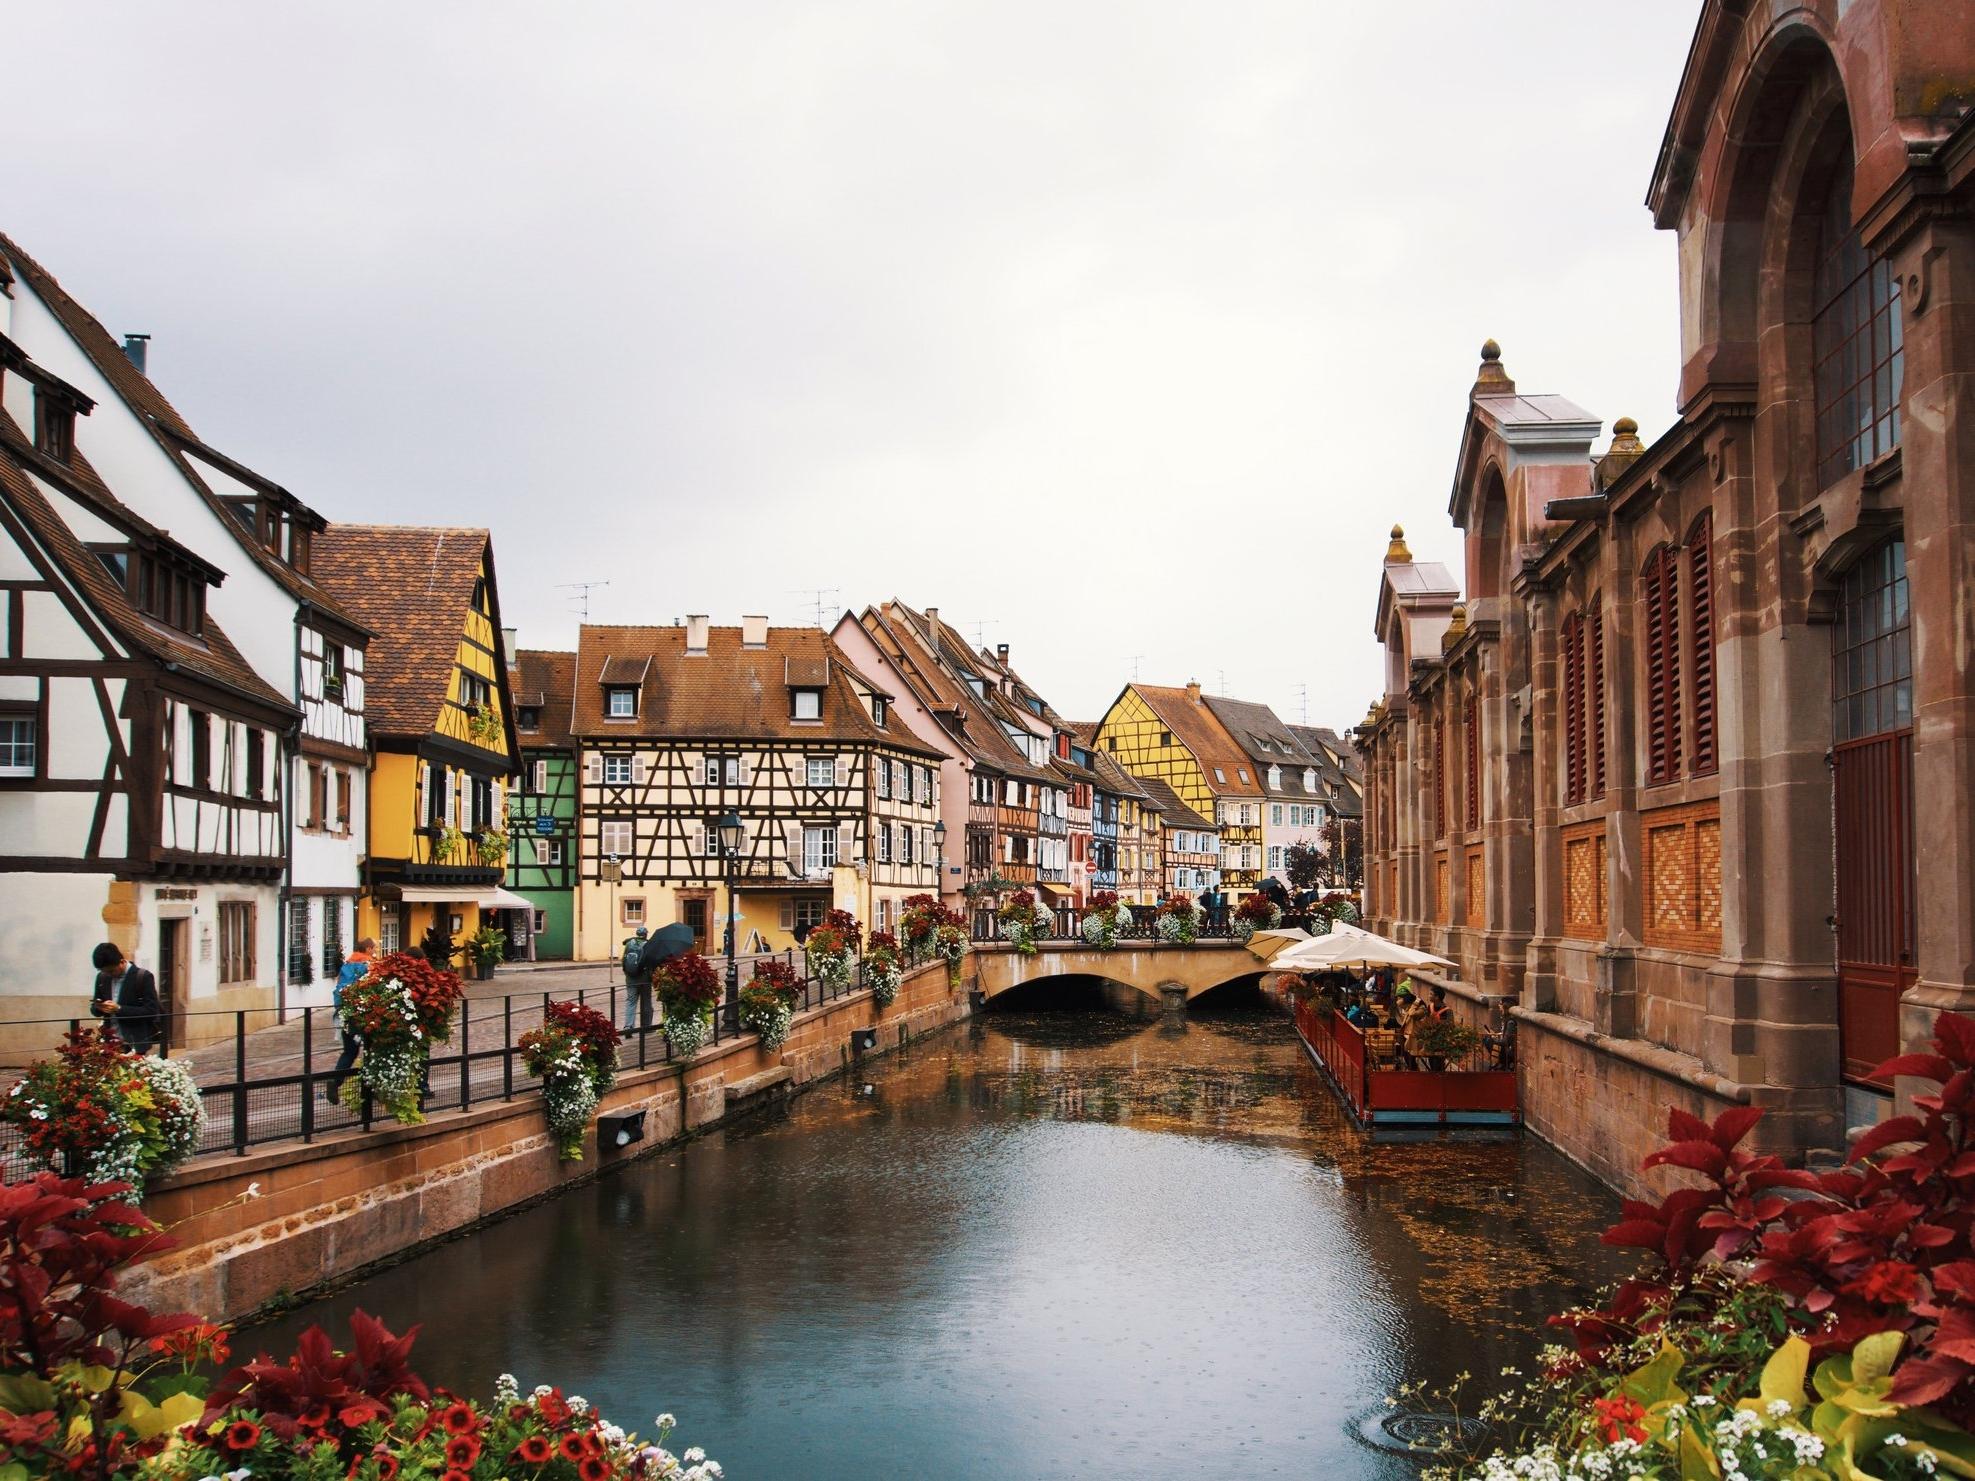 wandermust-village-towns-3.jpg